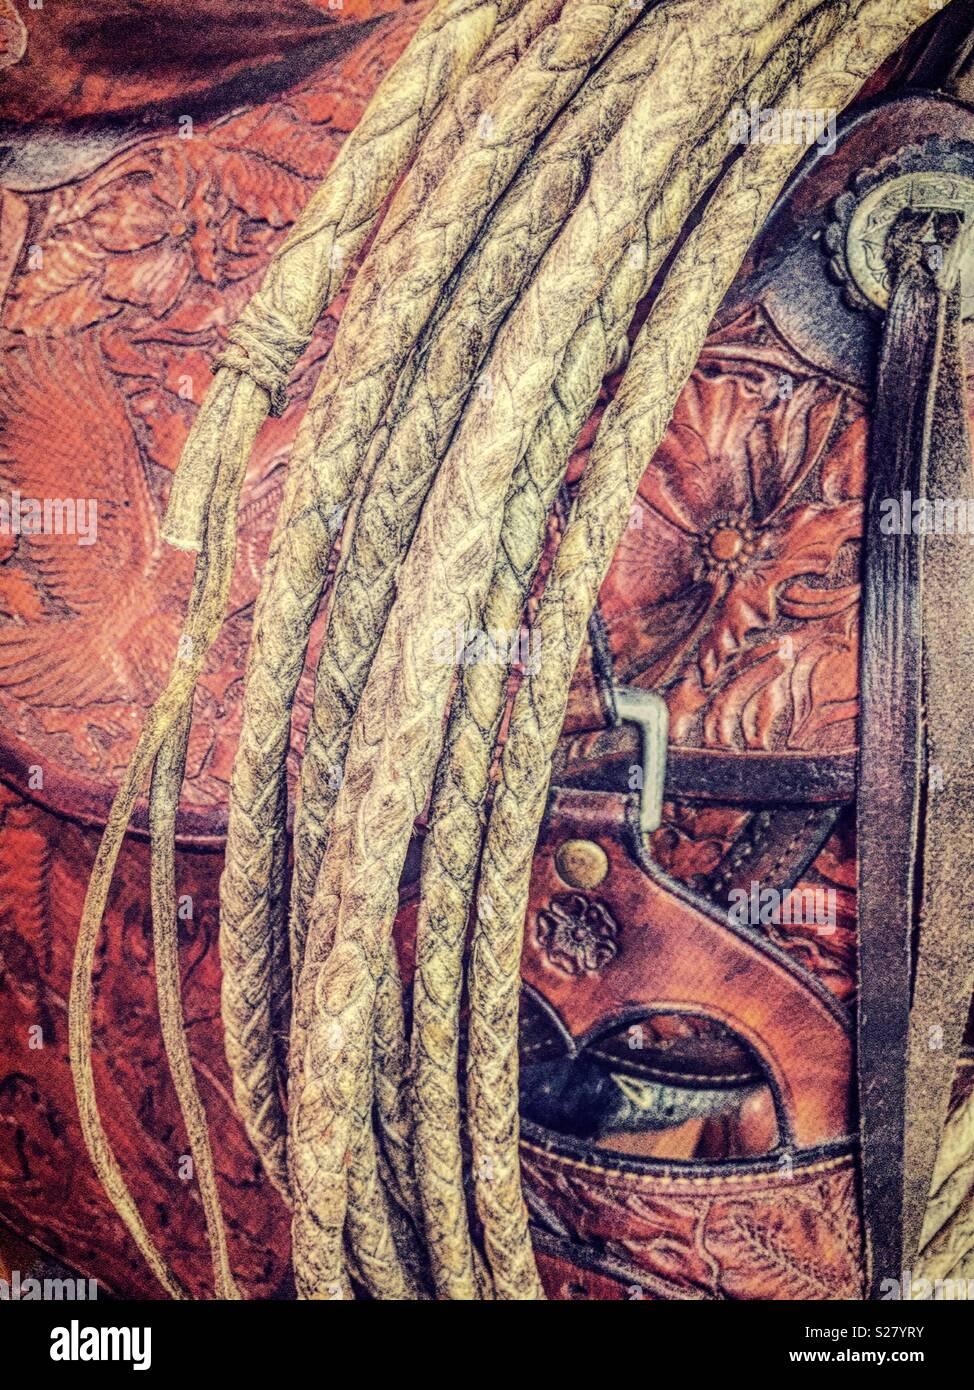 Rawhide lasso is displayed with vintage leather western saddle, Montana, USA - Stock Image